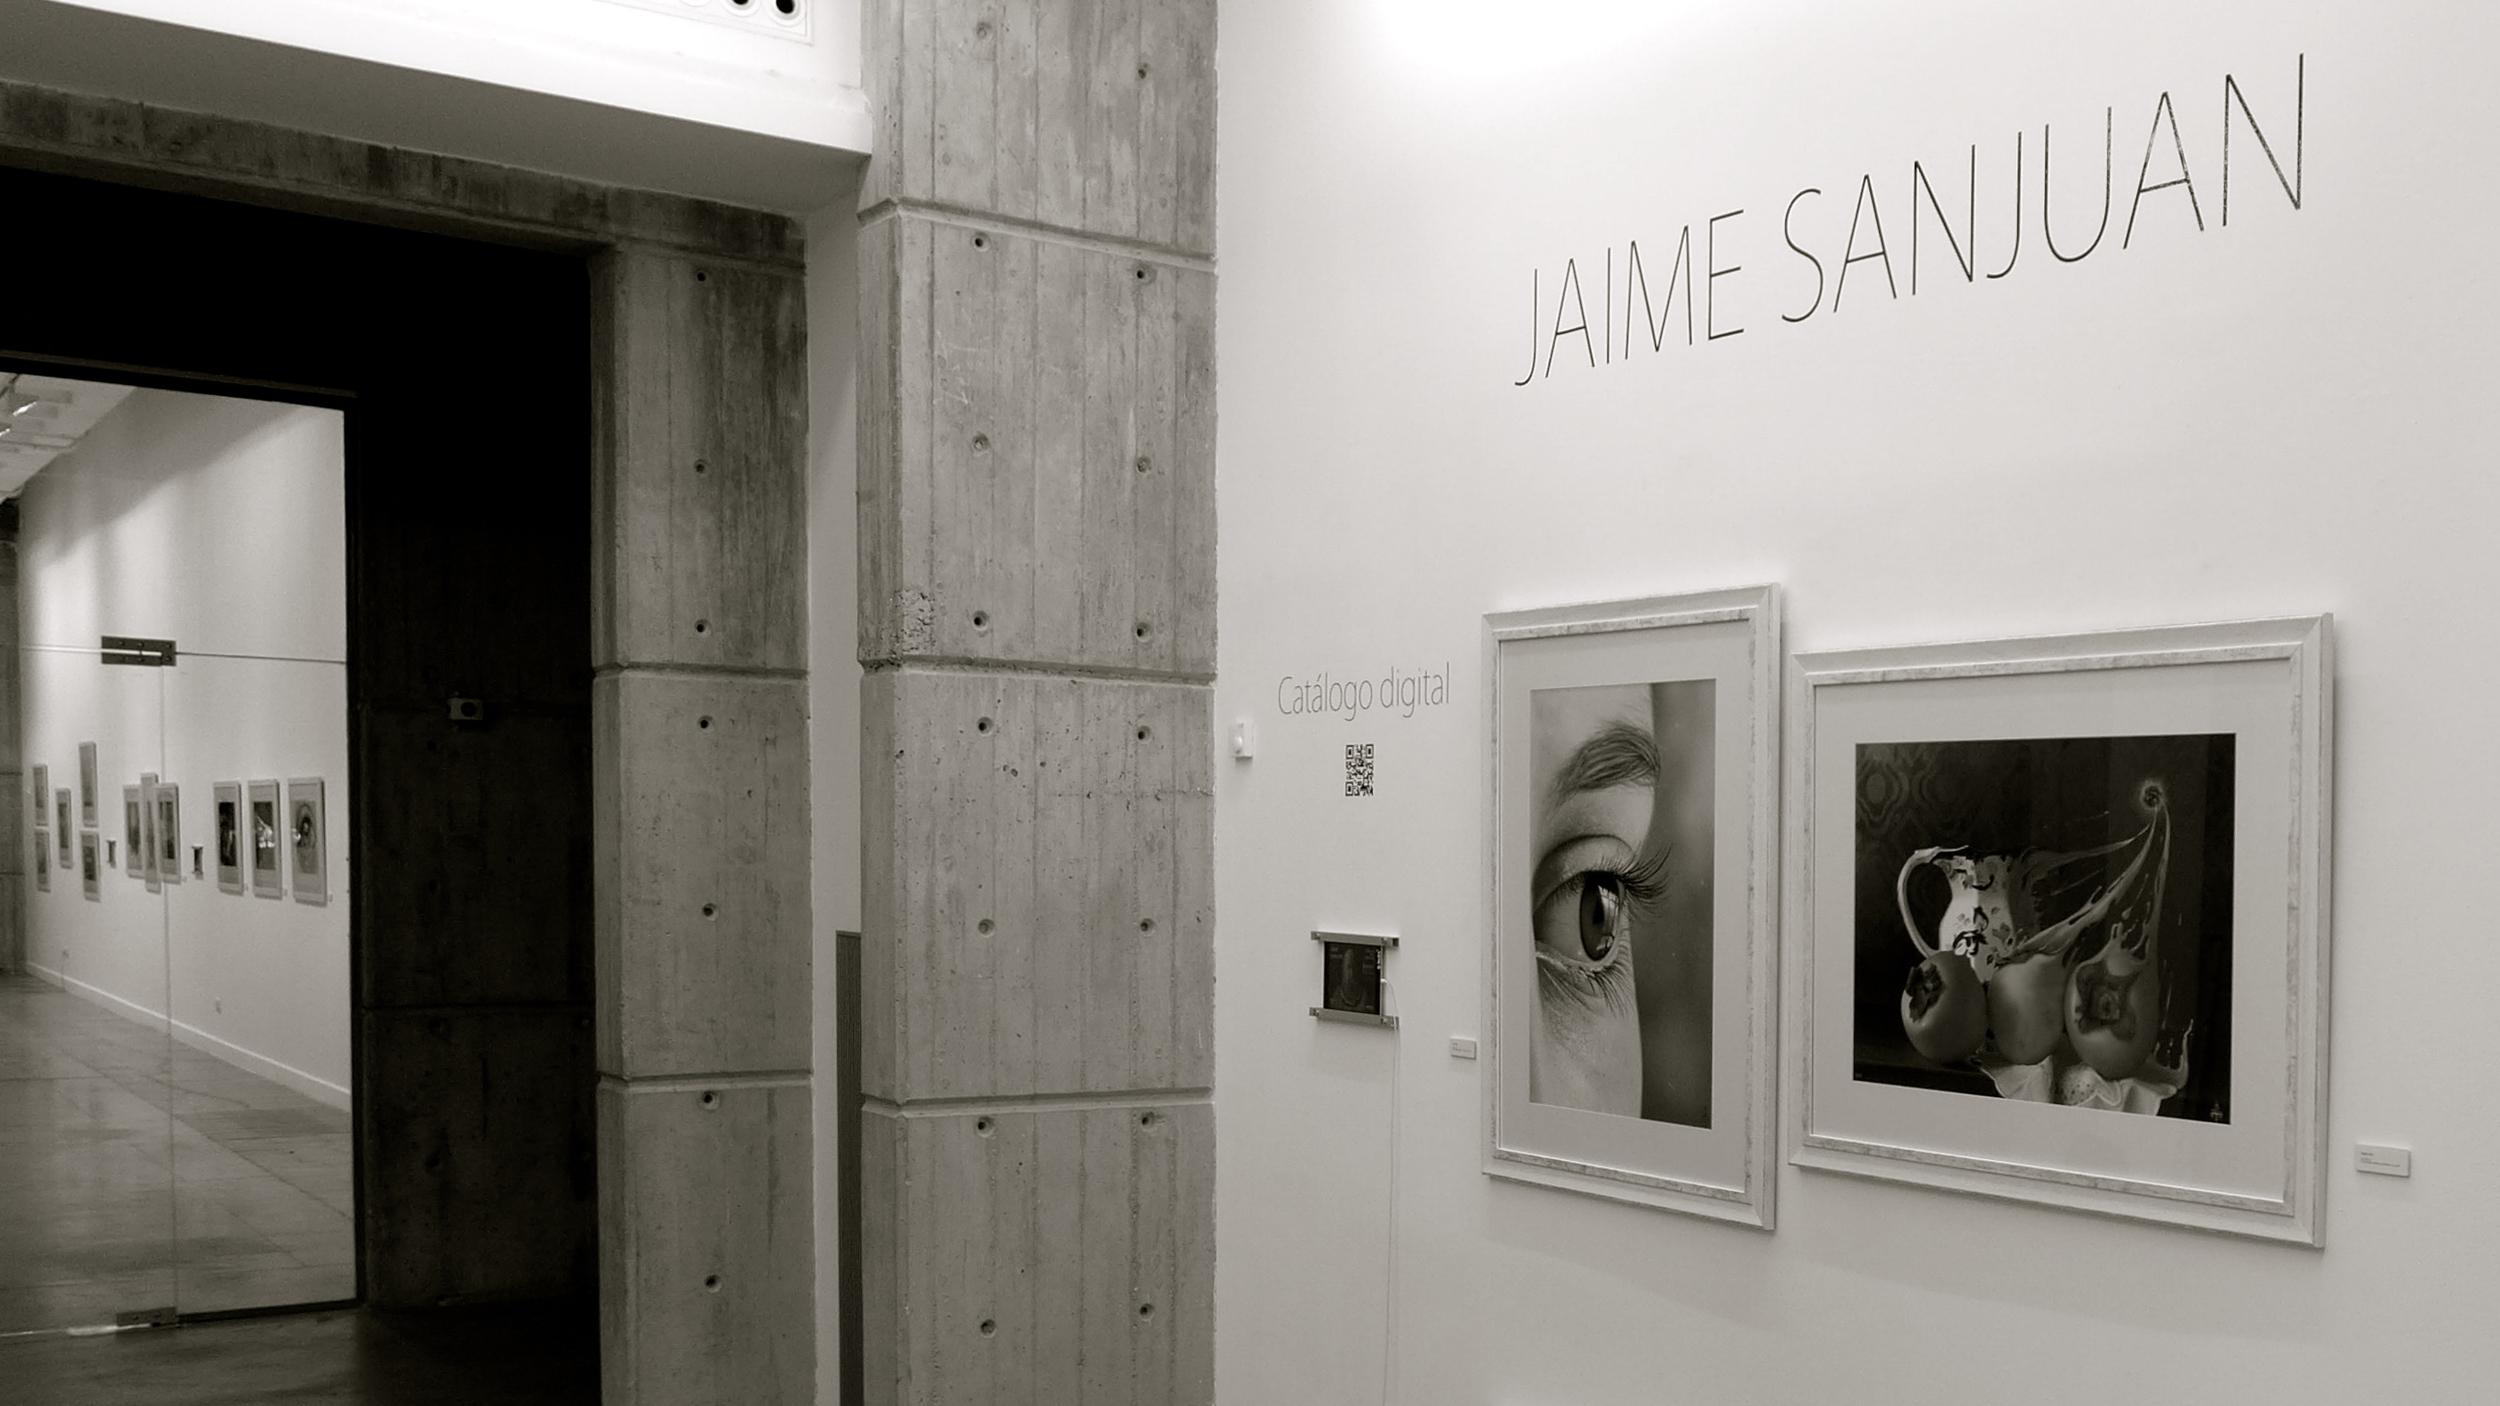 Jaime Sanjuán - 01